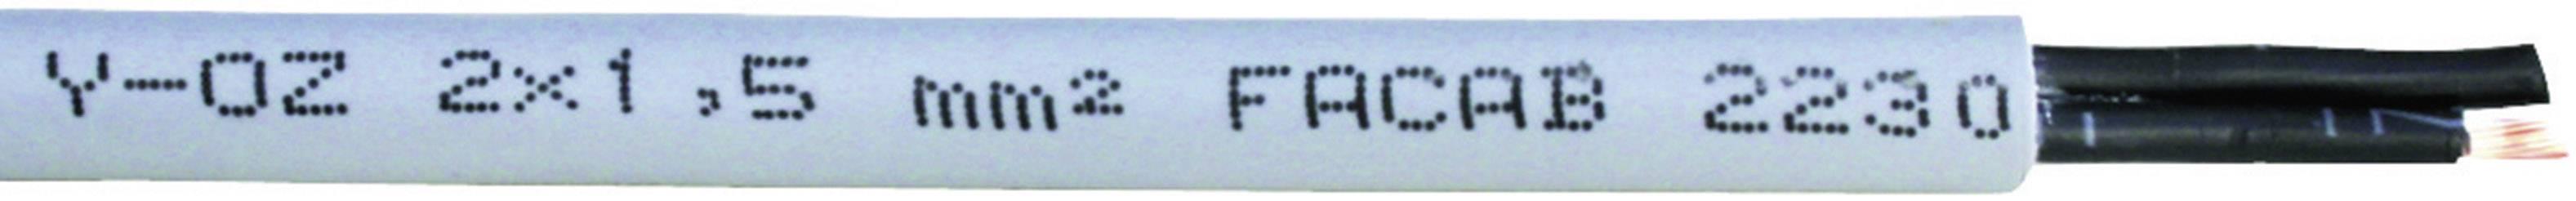 Riadiaci kábel Faber Kabel YSLY-OZ 030168, 2 x 1 mm², vonkajší Ø 5.60 mm, 500 V, metrový tovar, sivá